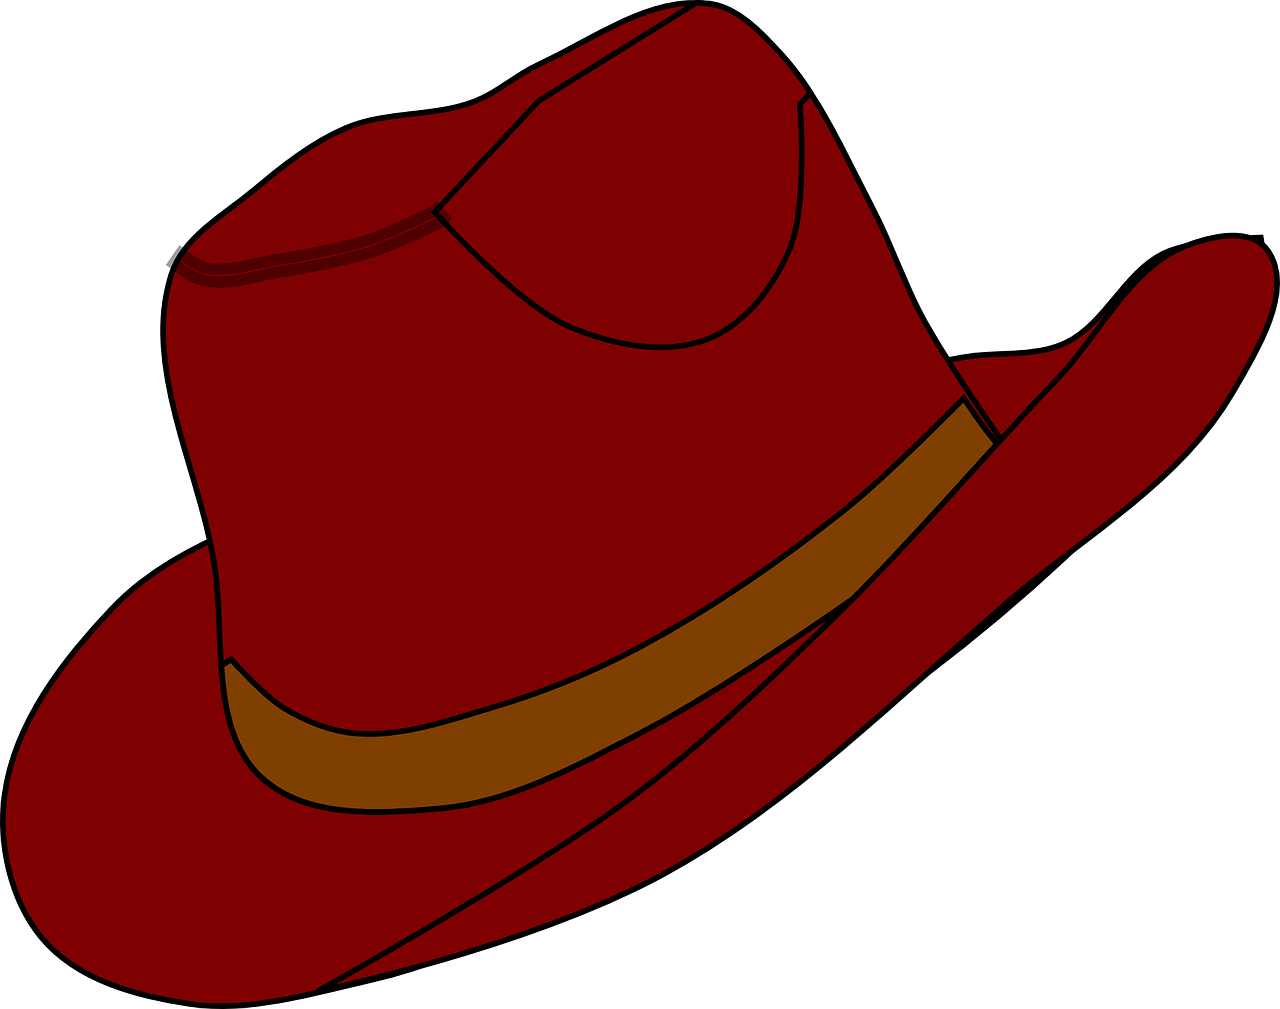 Cowboy hat clipart free danaspaj top